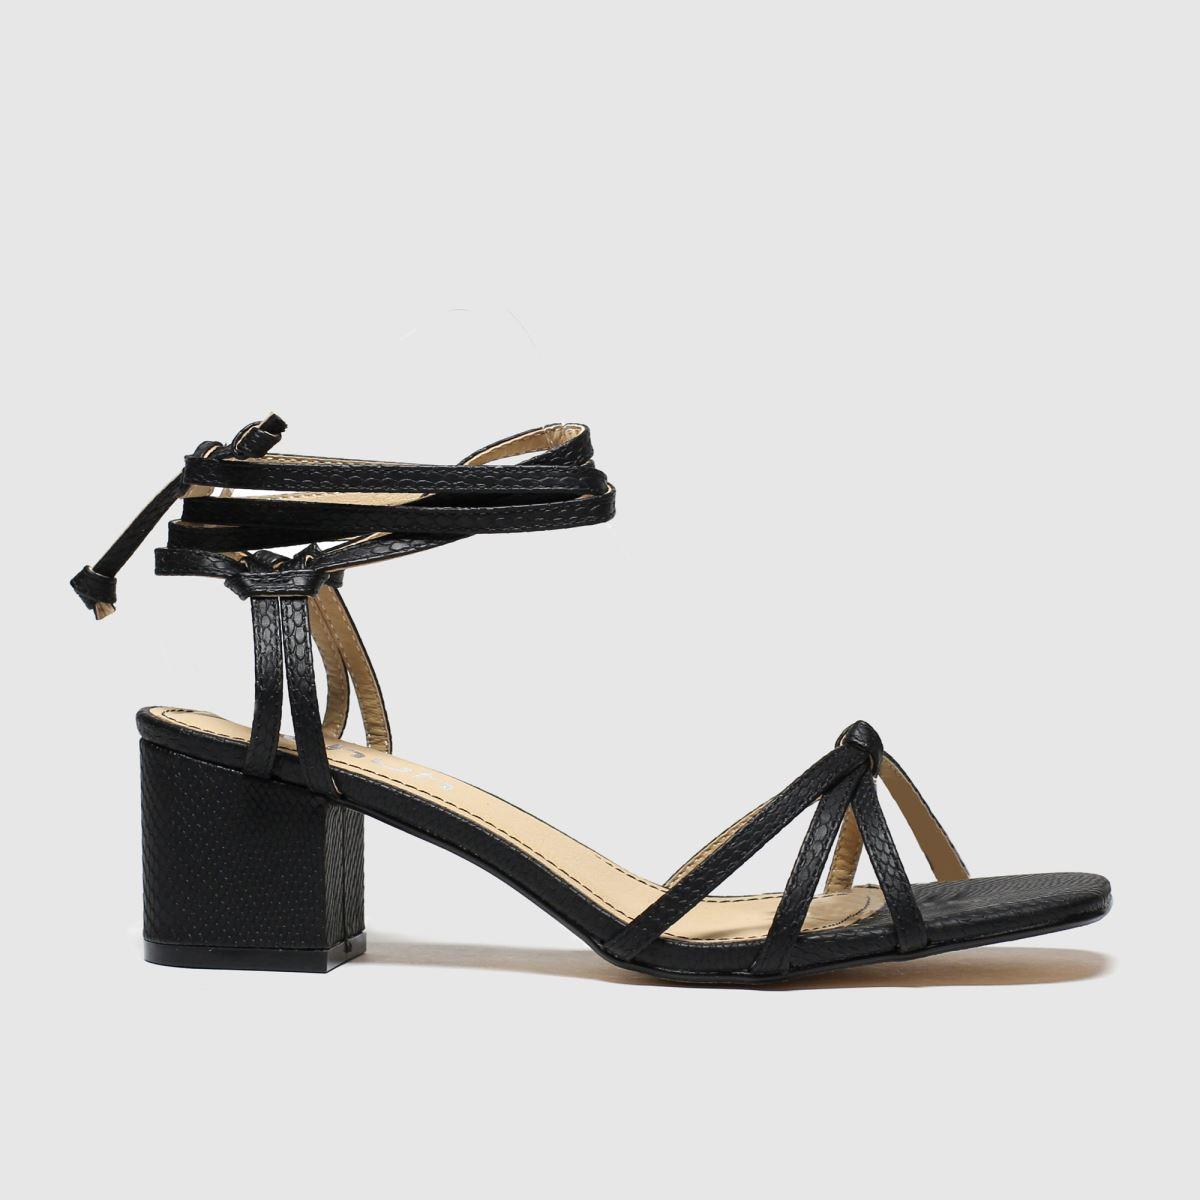 schuh Schuh Black Sentiment High Heels